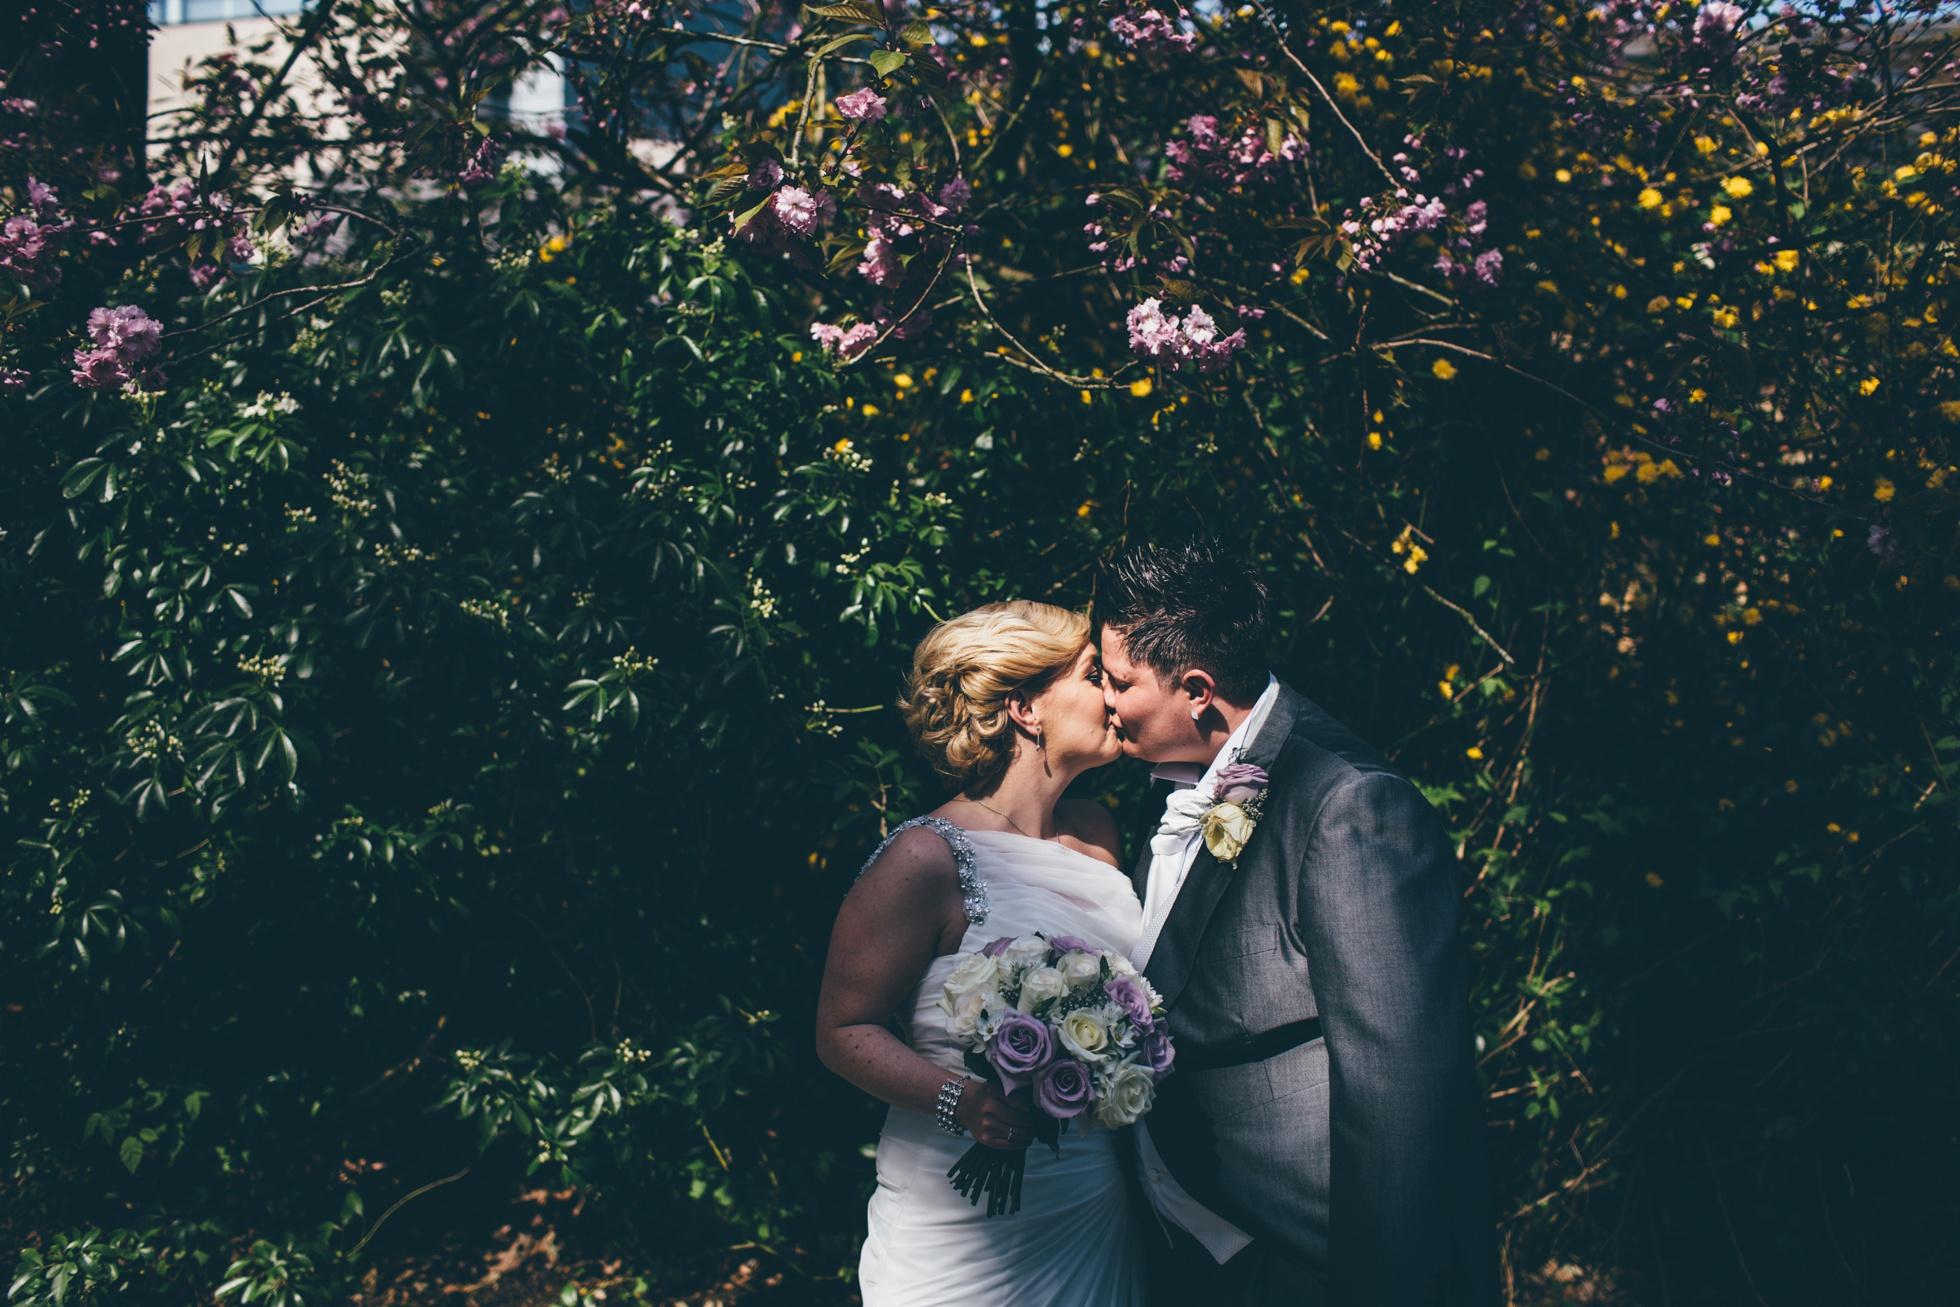 gay wedding portrait photography northern ireland